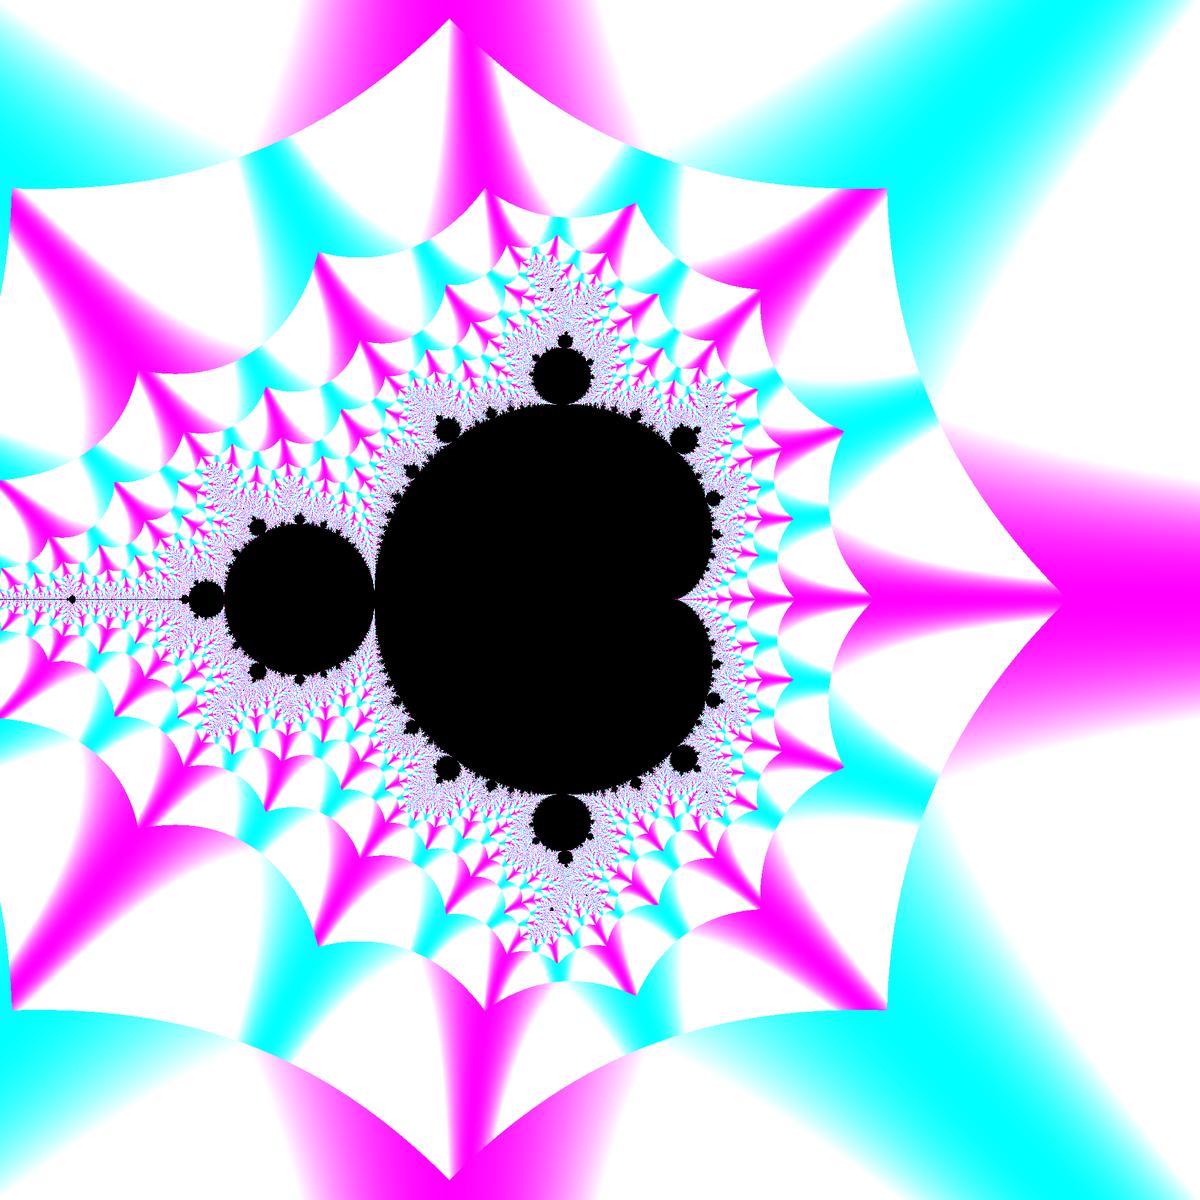 f:id:Hassium277:20210320212654p:plain